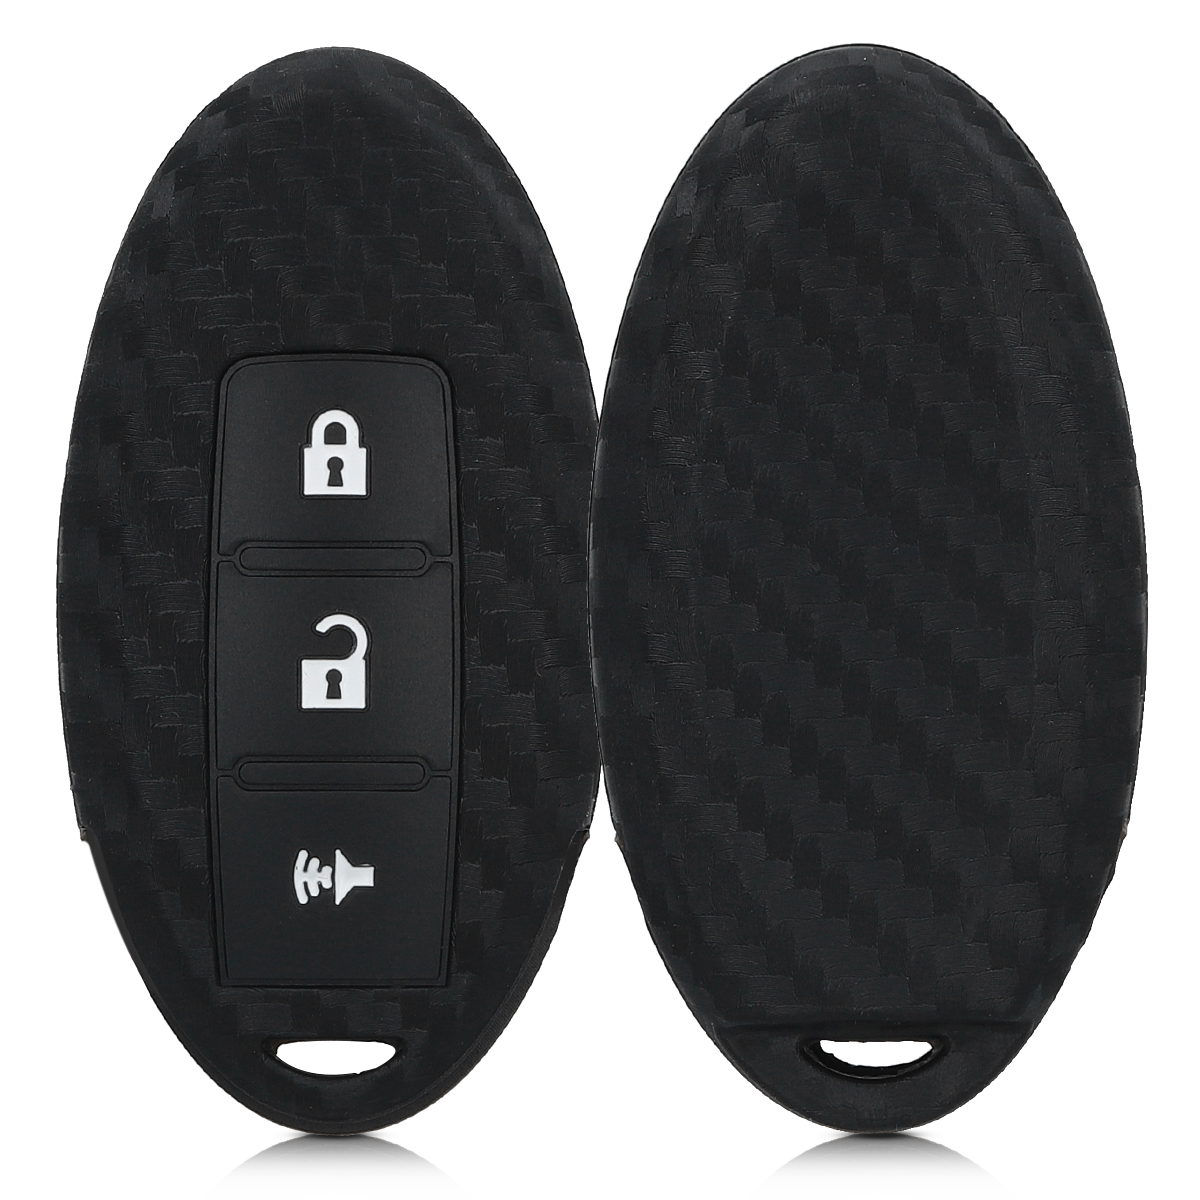 KW Silicone Θήκη Κλειδιού Nissan - 3 Κουμπιά - Black (46050.03)